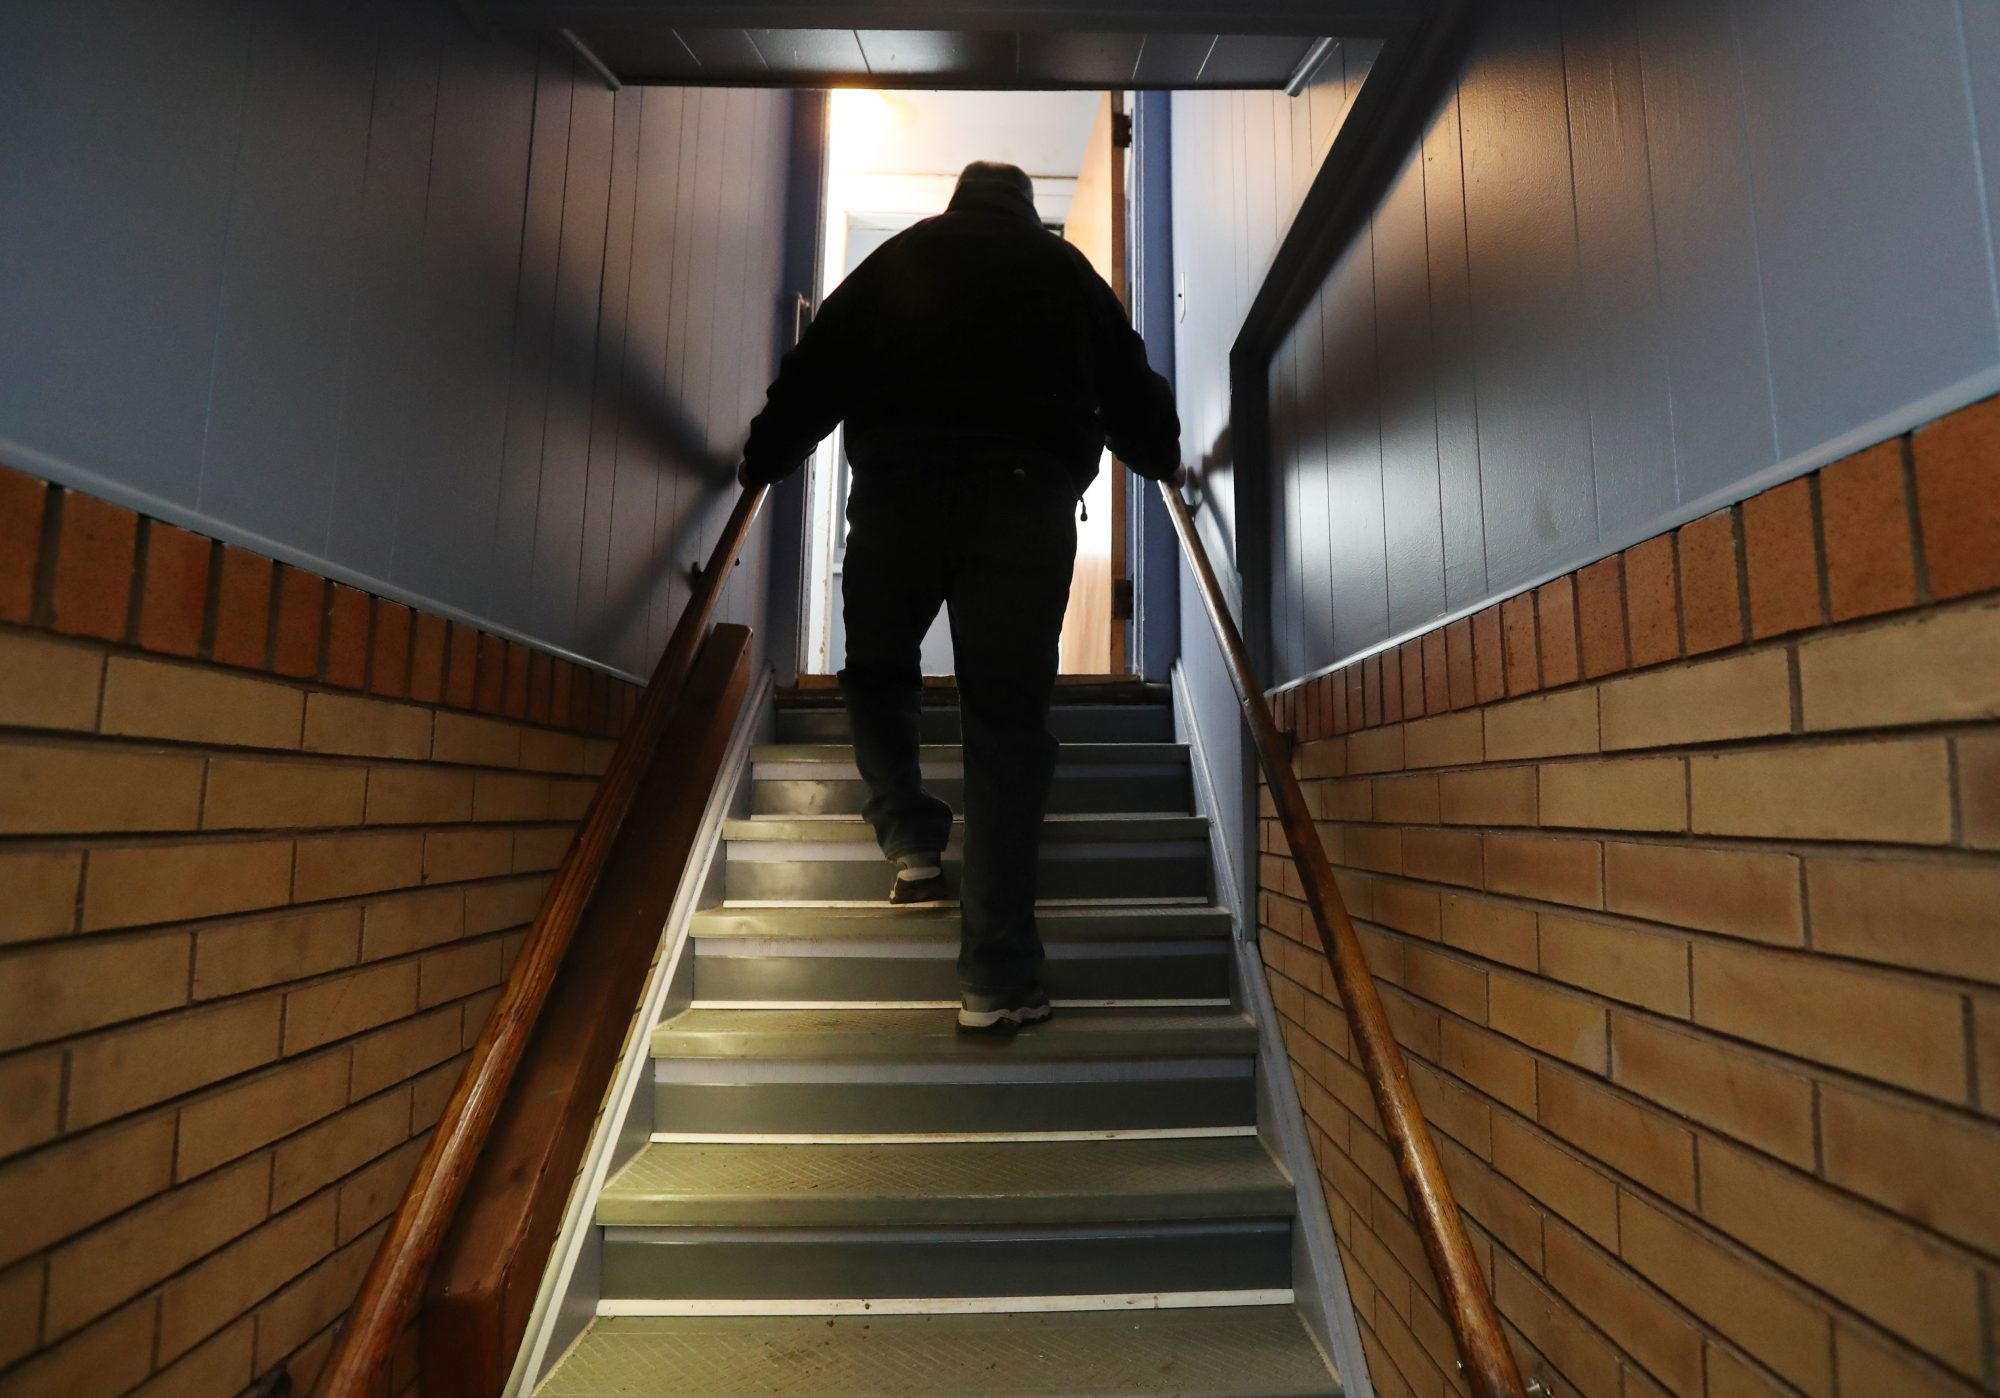 After veteran dies in fall, push for elevator intensifies at American Legion post